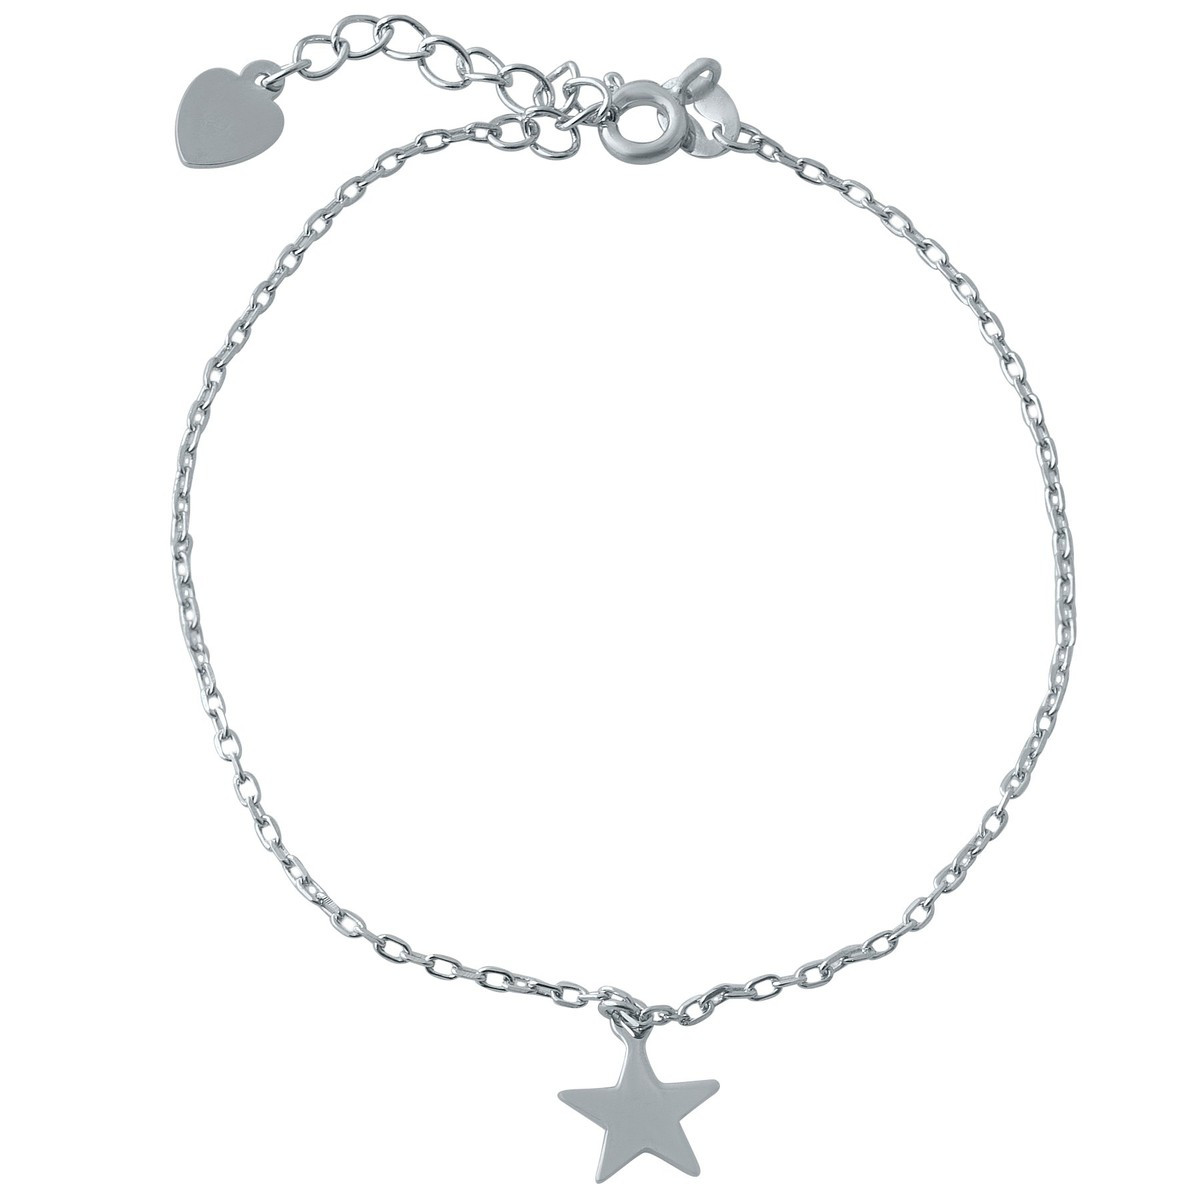 Серебряный браслет DreamJewelry без камней (1994238) 1720 размер